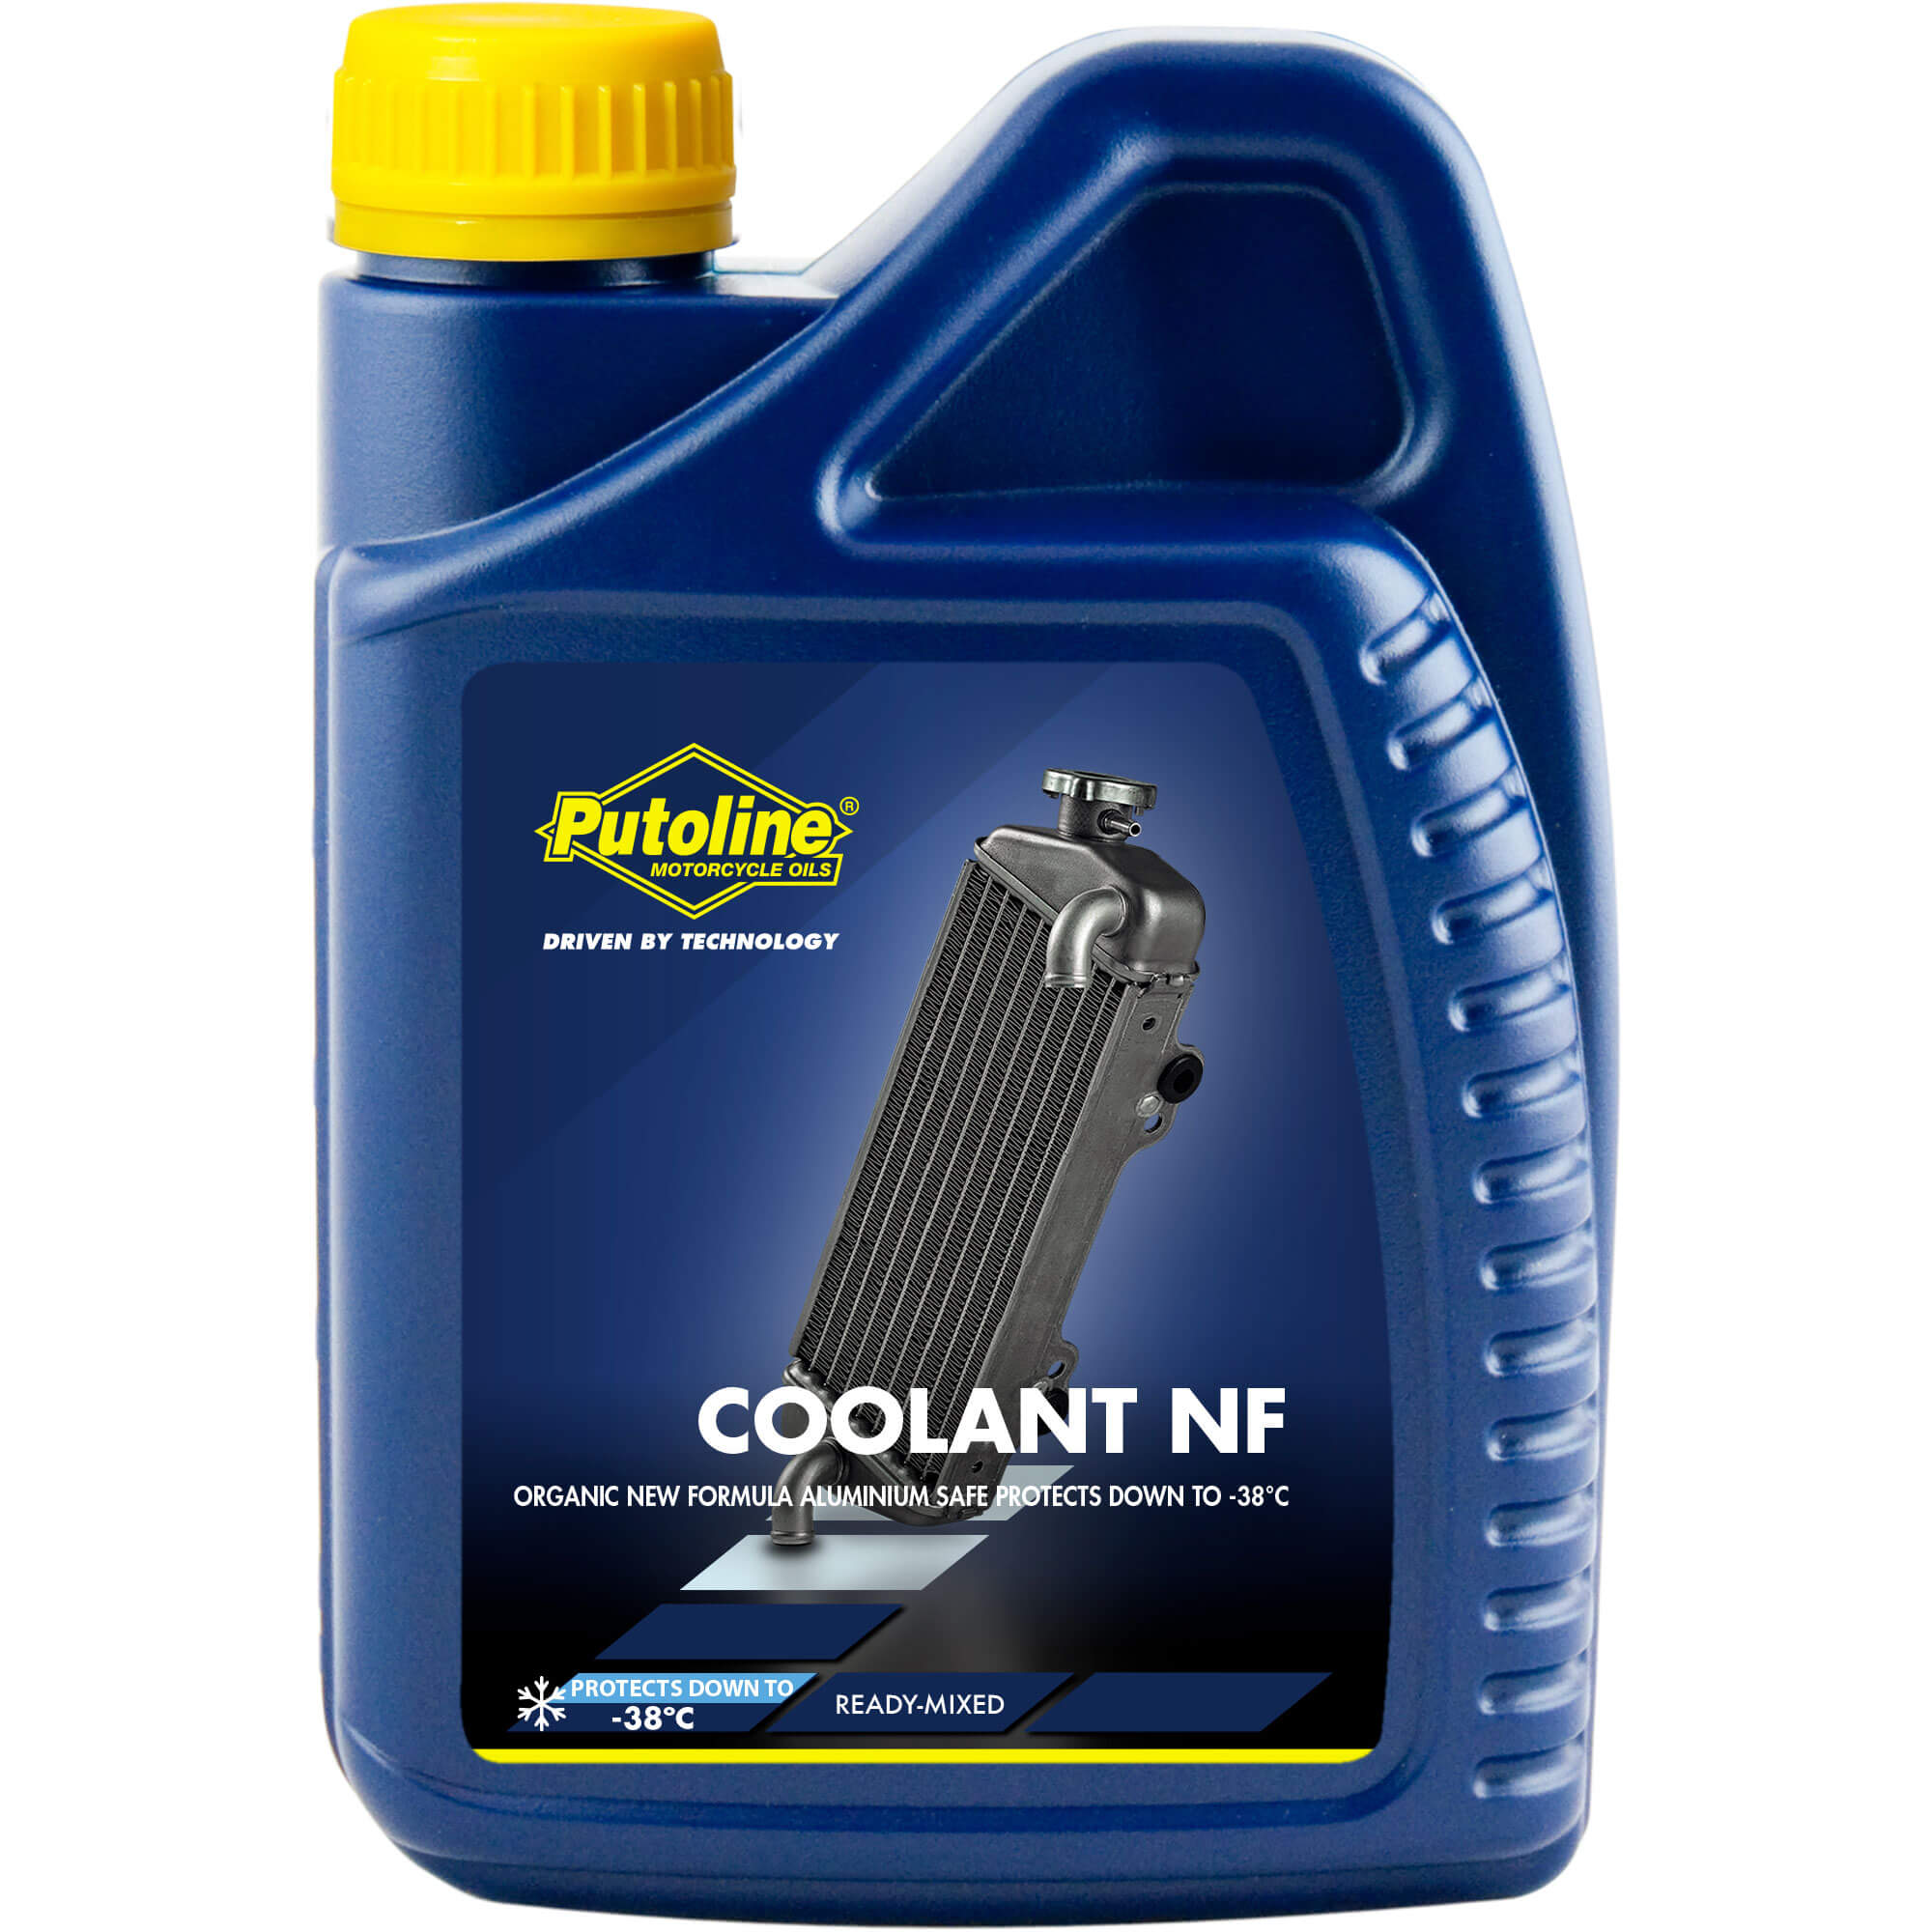 1L Liquide de refroidissement Putoline Coolant NF